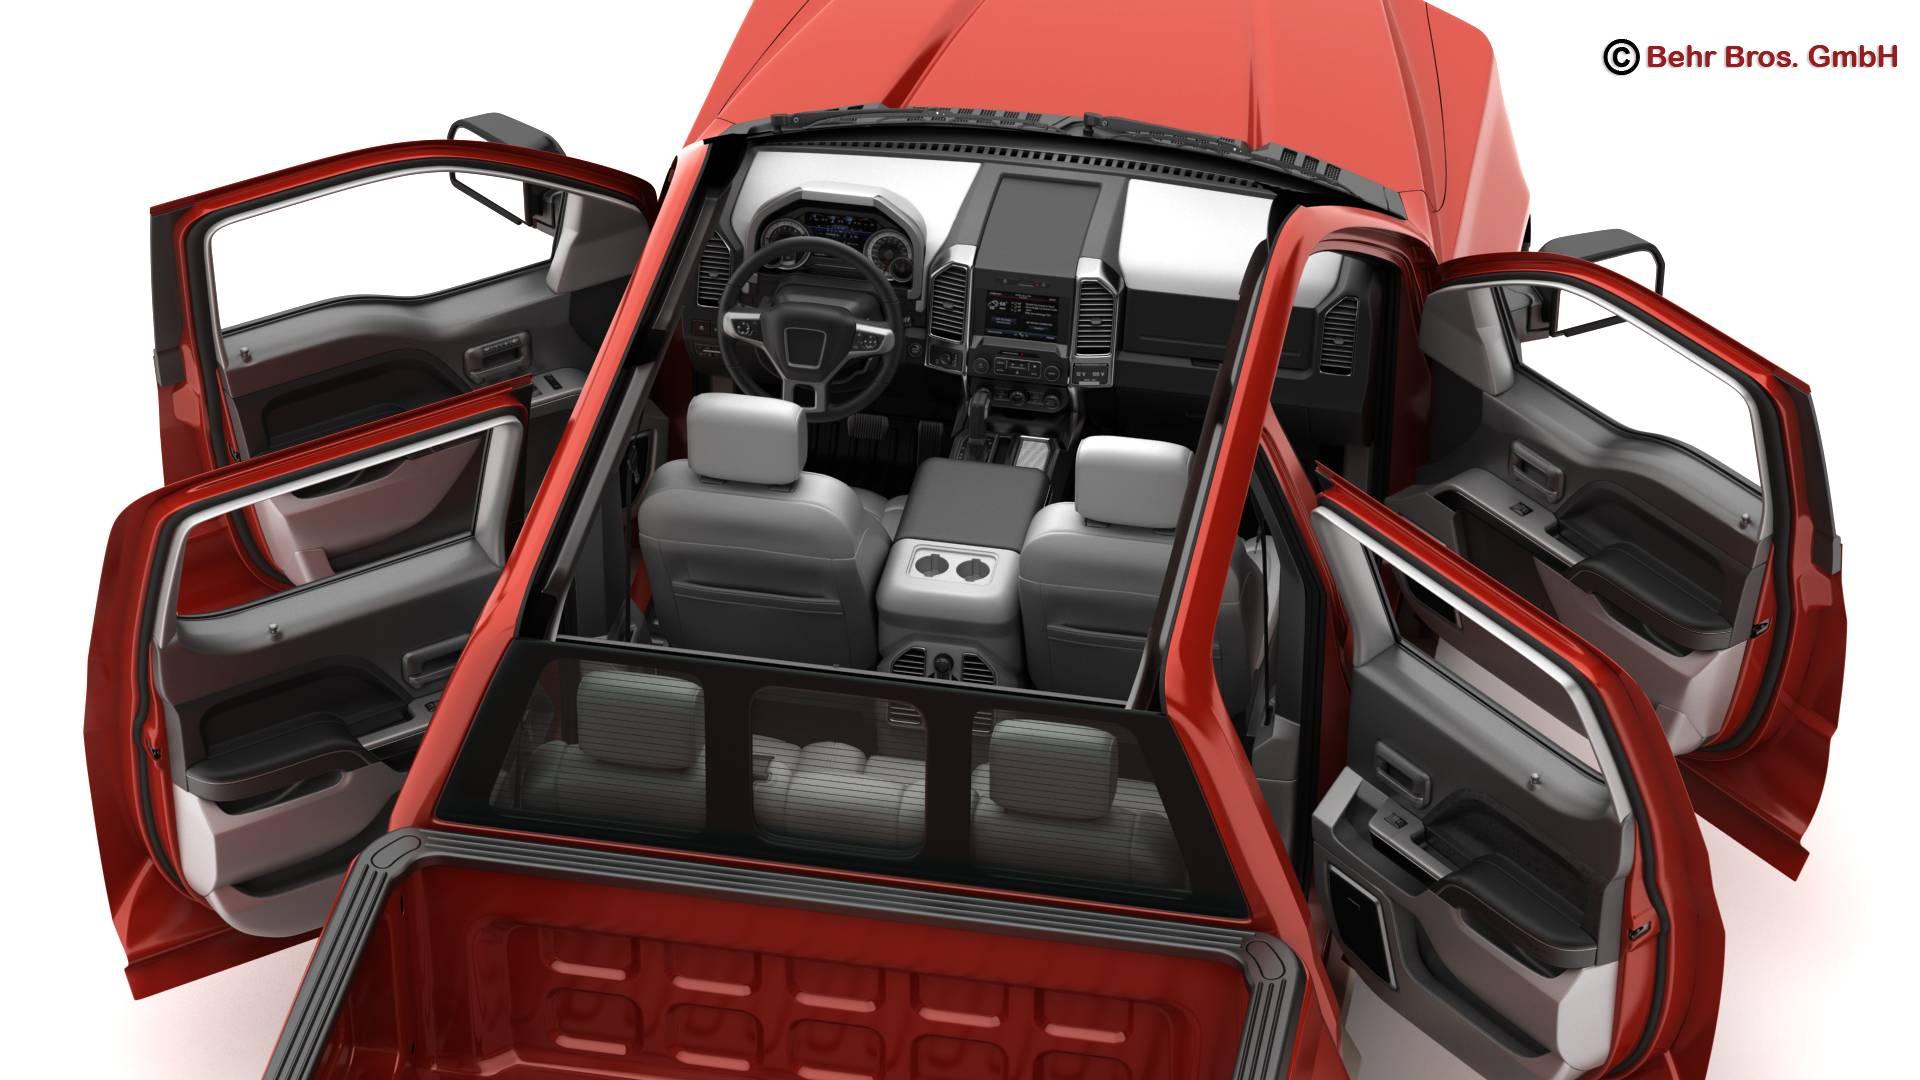 generic pickup 3d model 3ds max fbx c4d lwo ma mb obj 219879